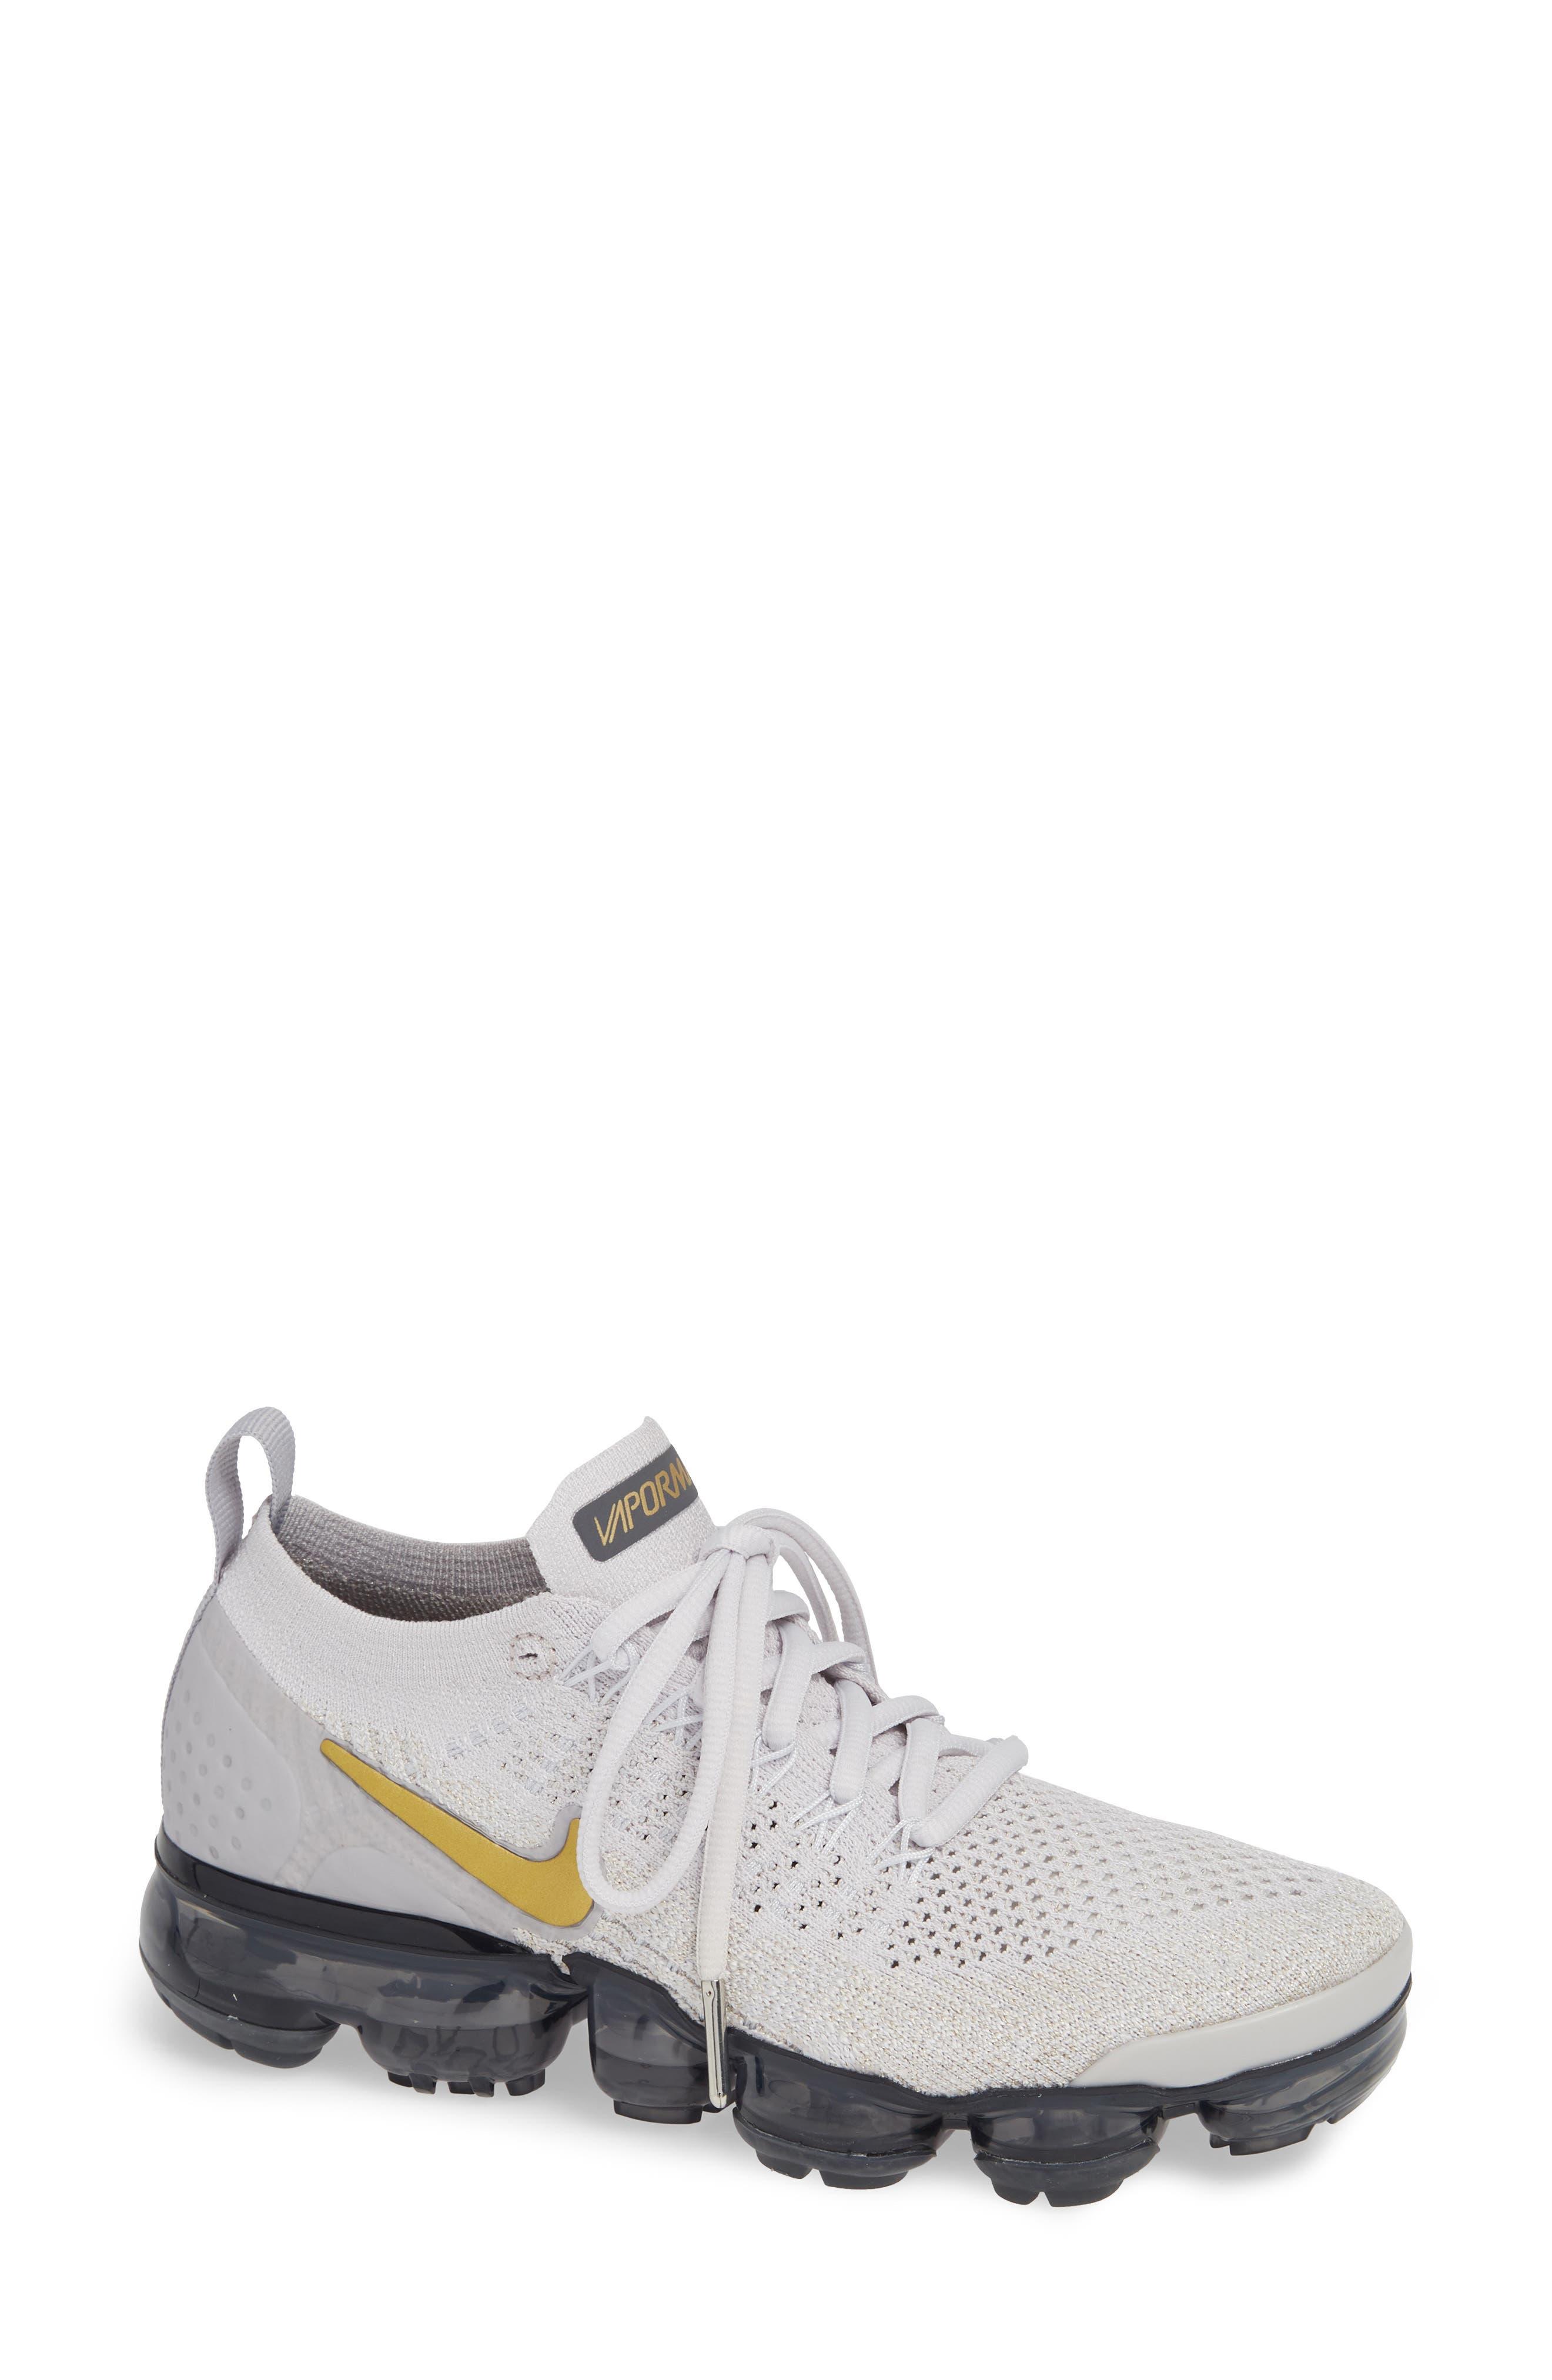 Women'S Air Vapormax Flyknit 2 Running Shoes, White